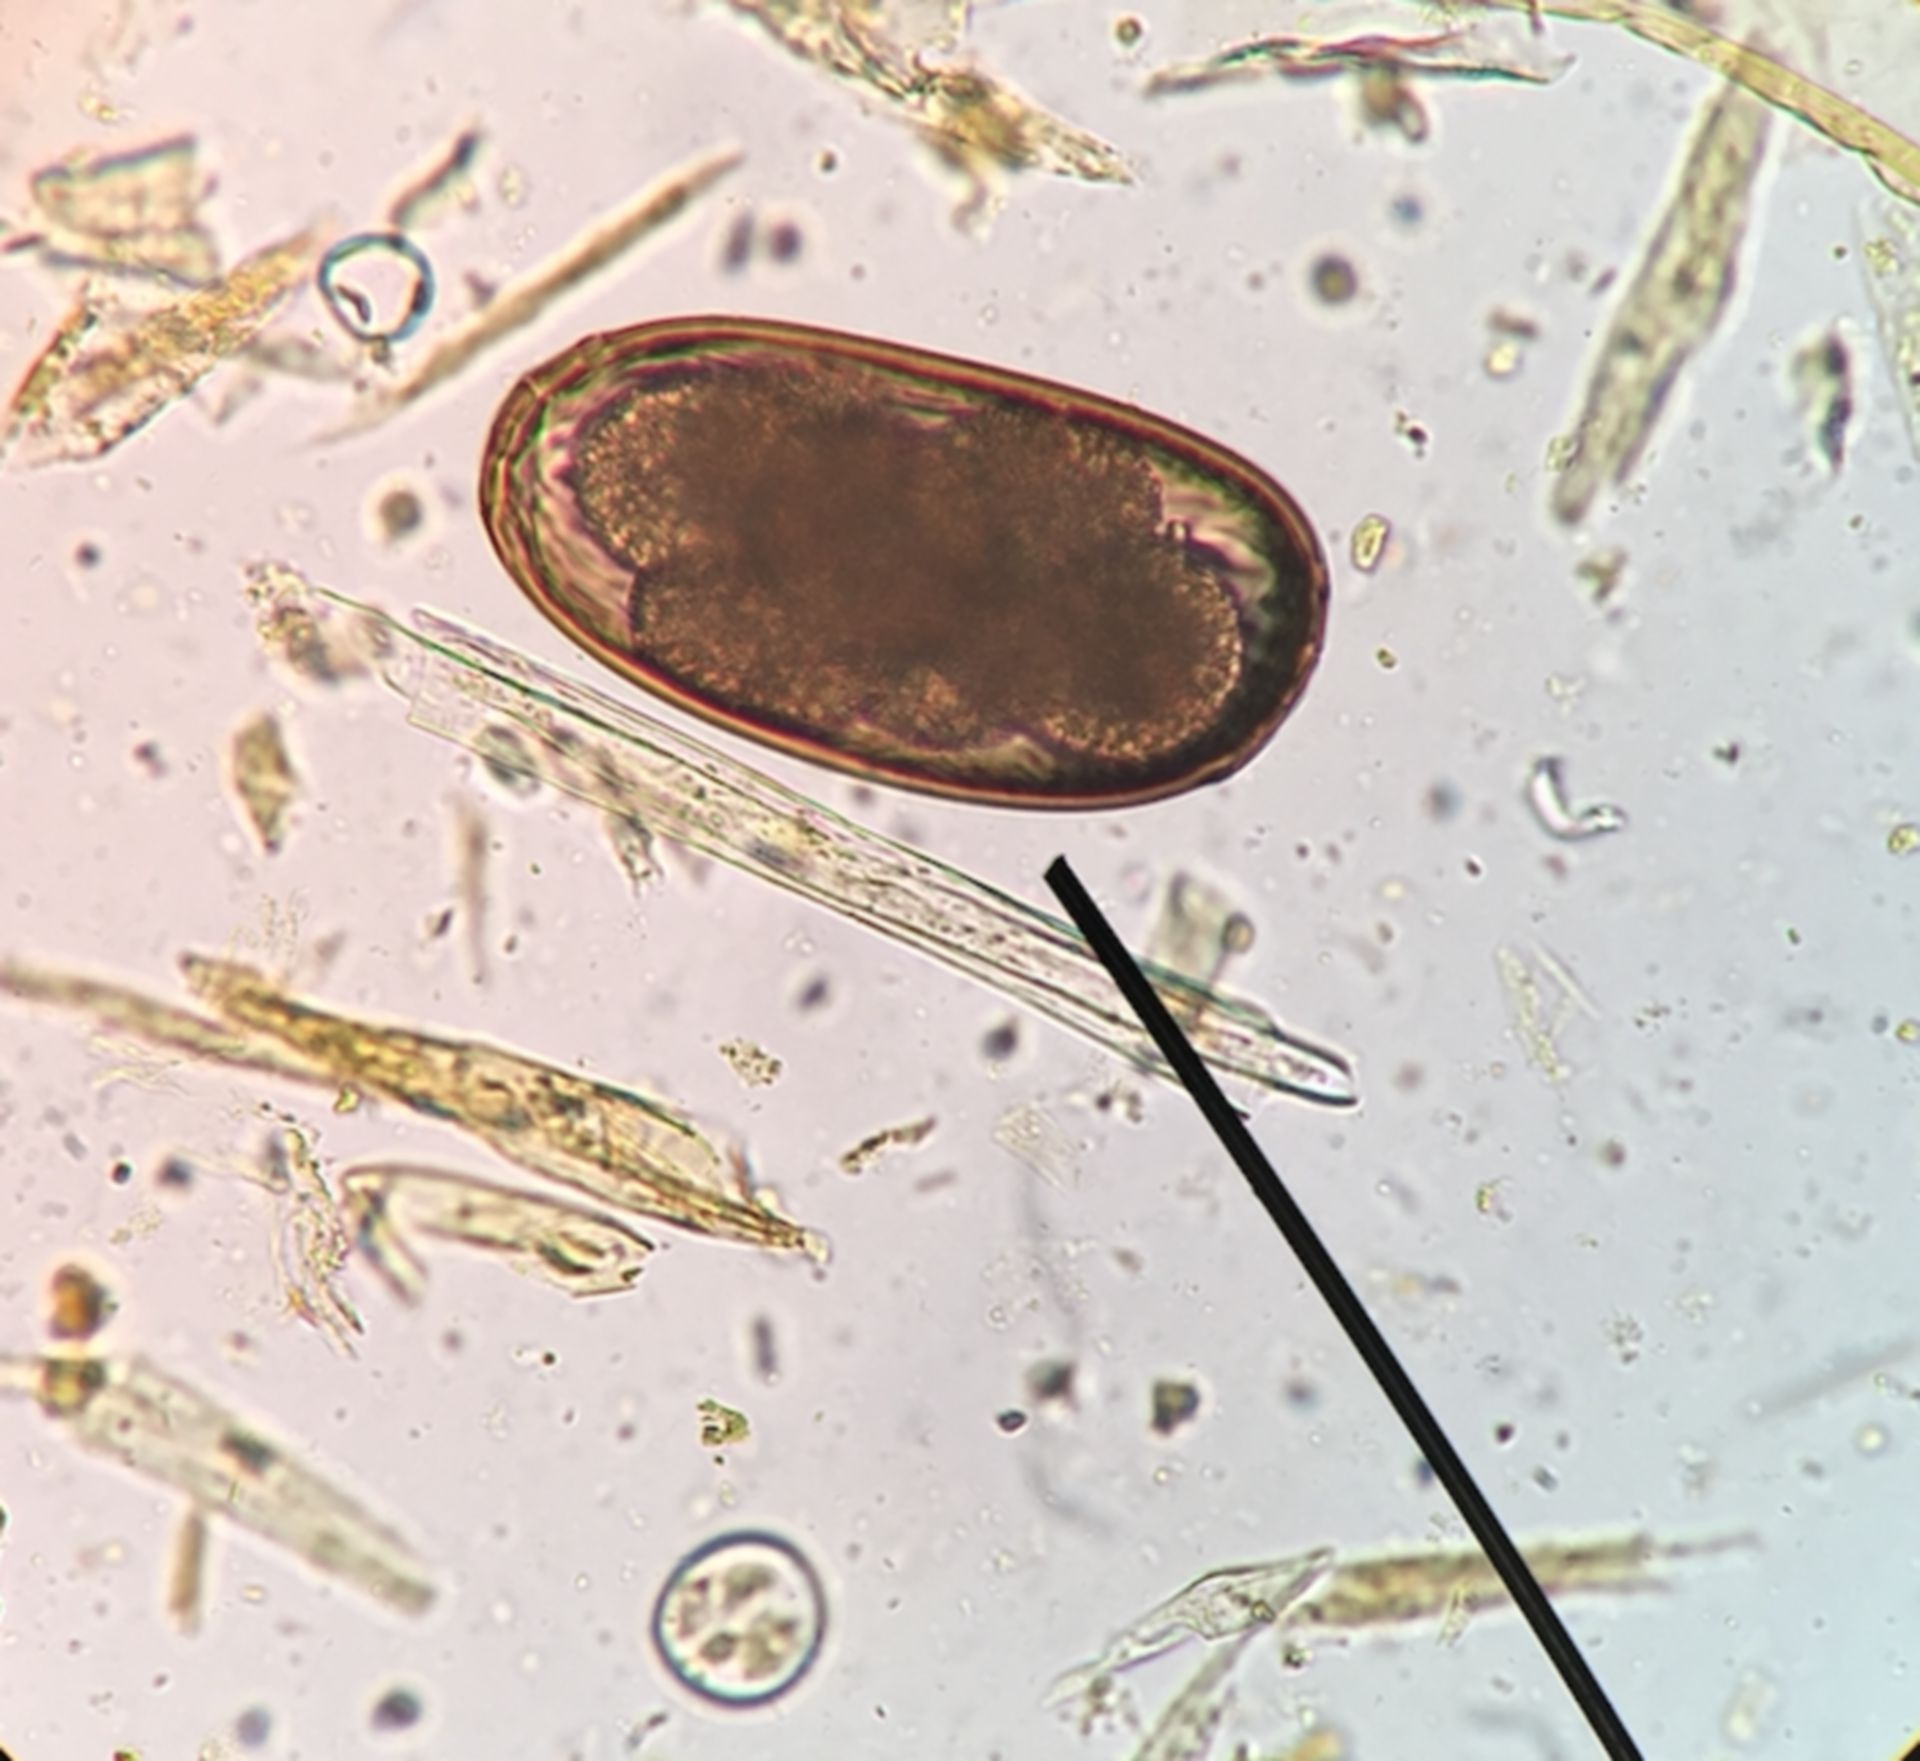 Nematodirus spp.